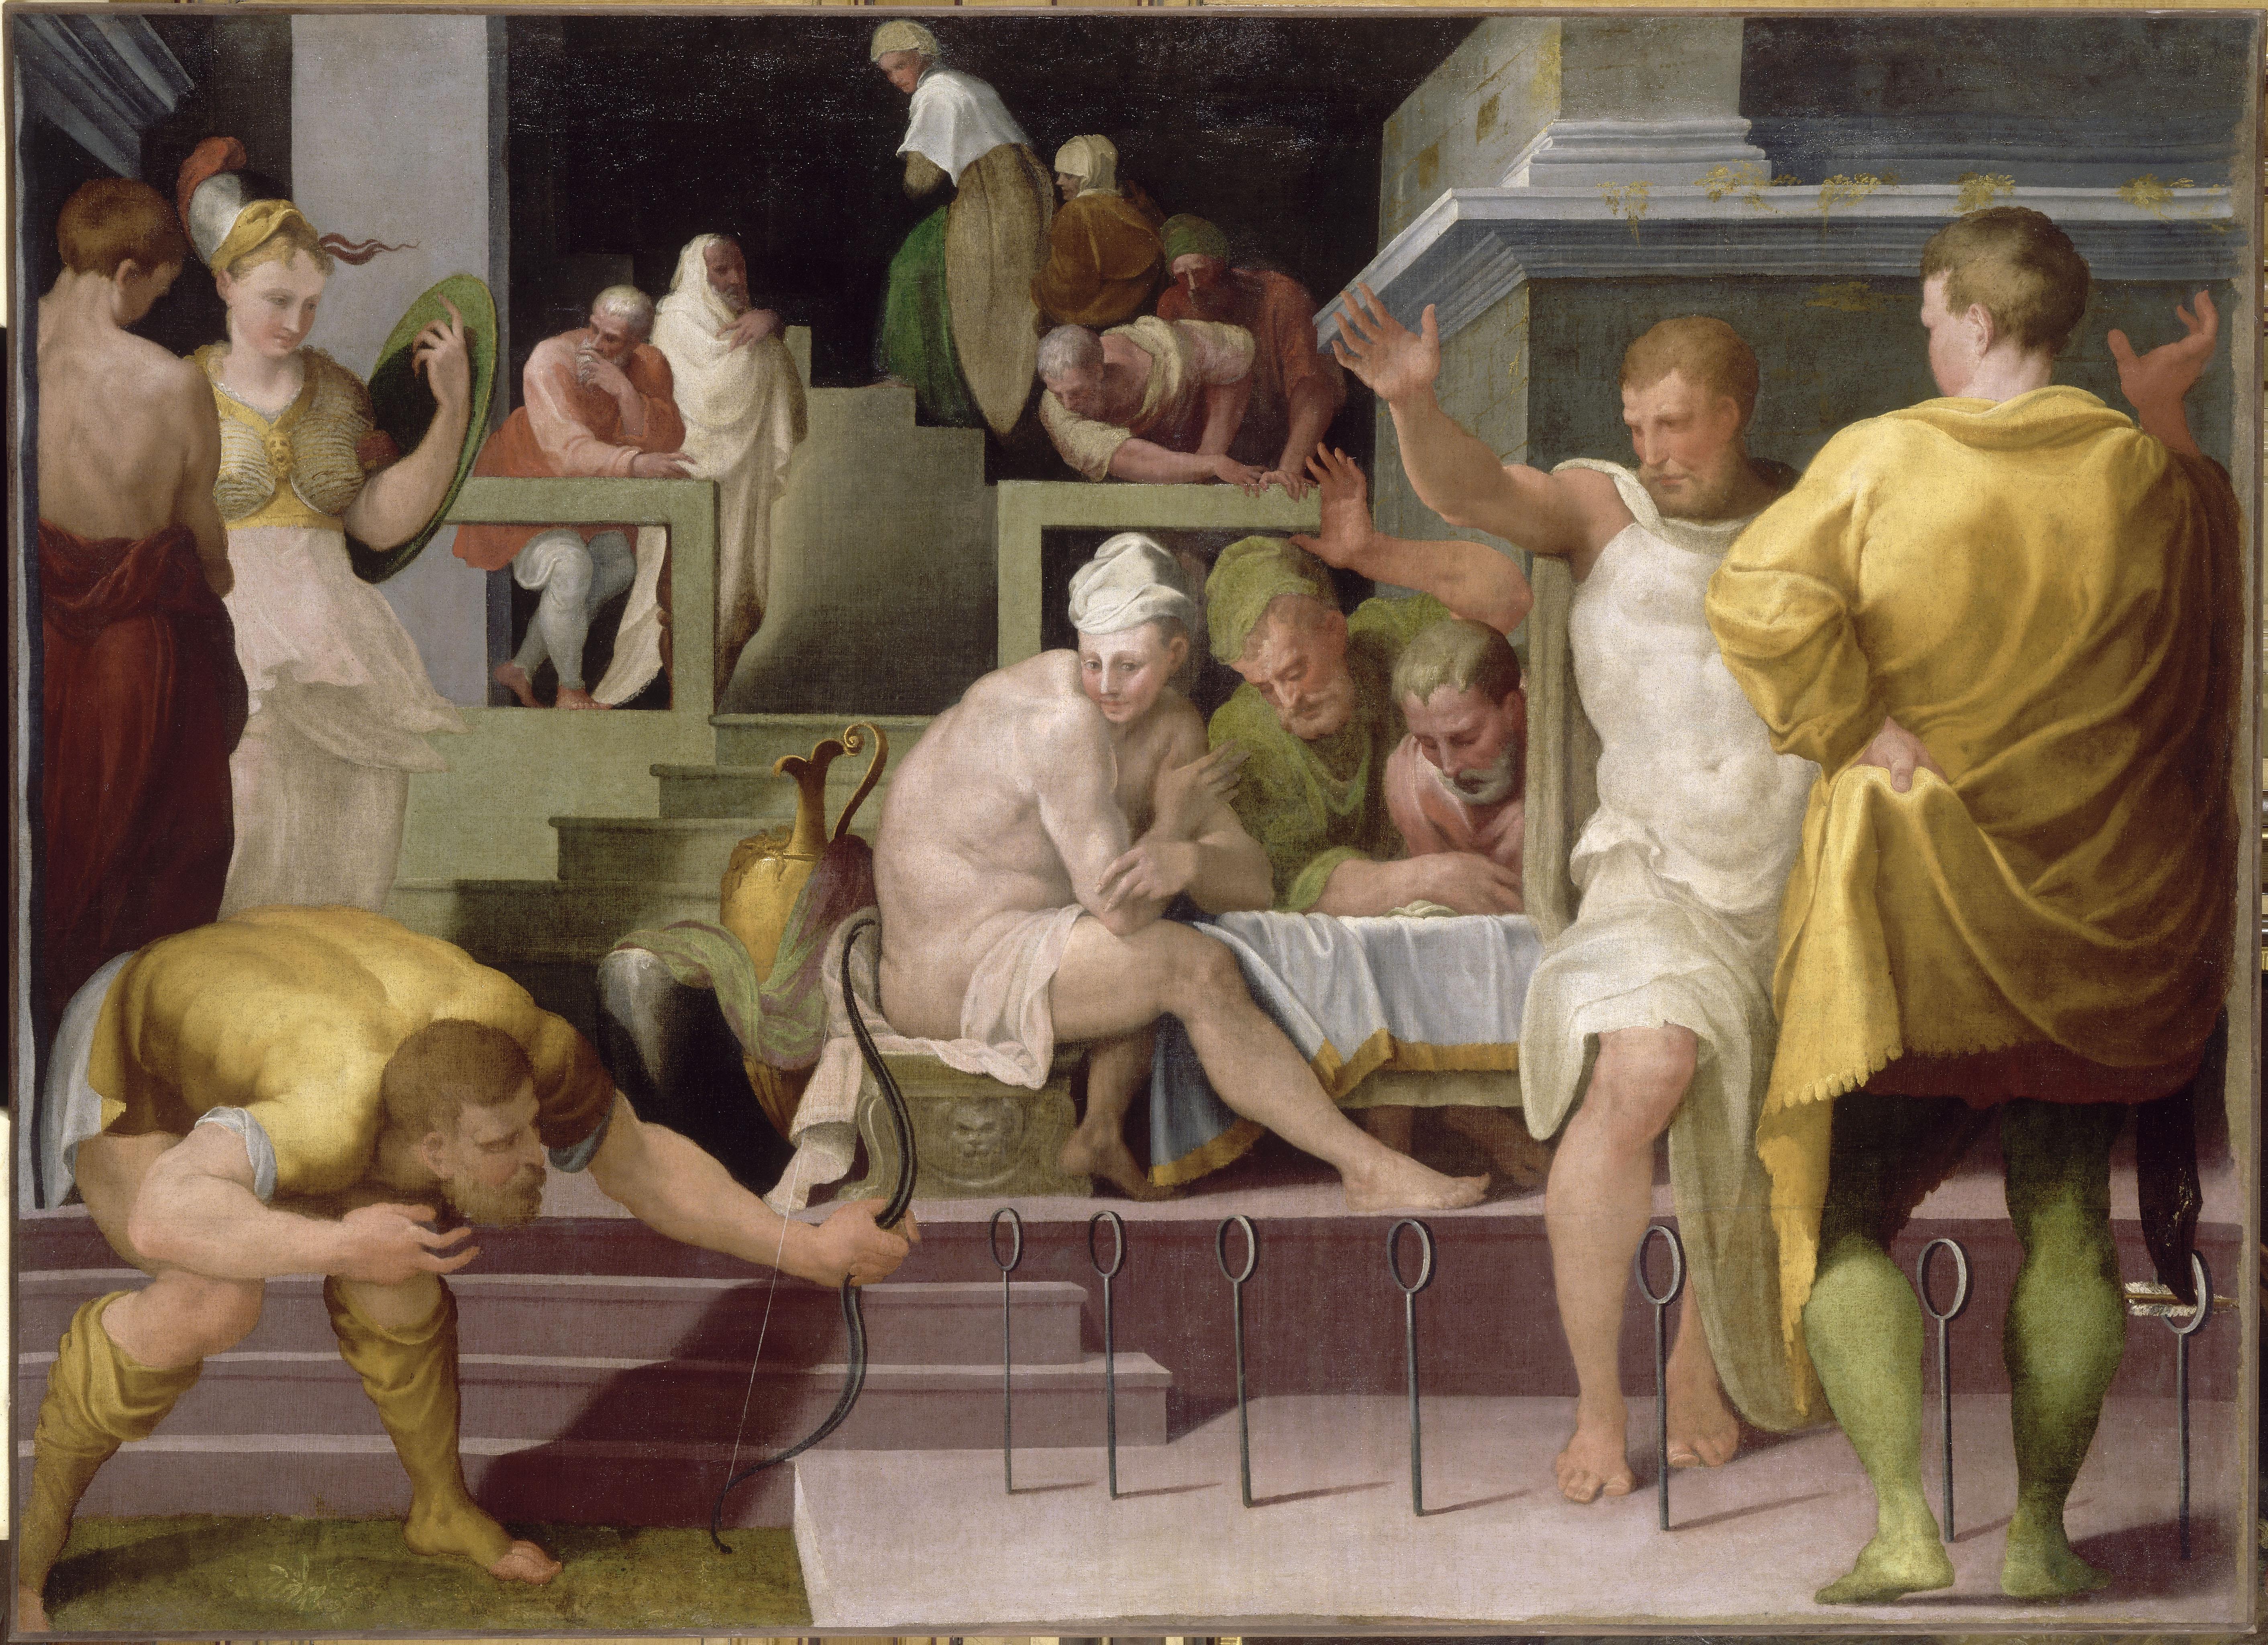 Ulysses in Ithaca. The archery game by Ruggiero de Ruggieri - château de Fontainebleau - © RMN Grand Palais